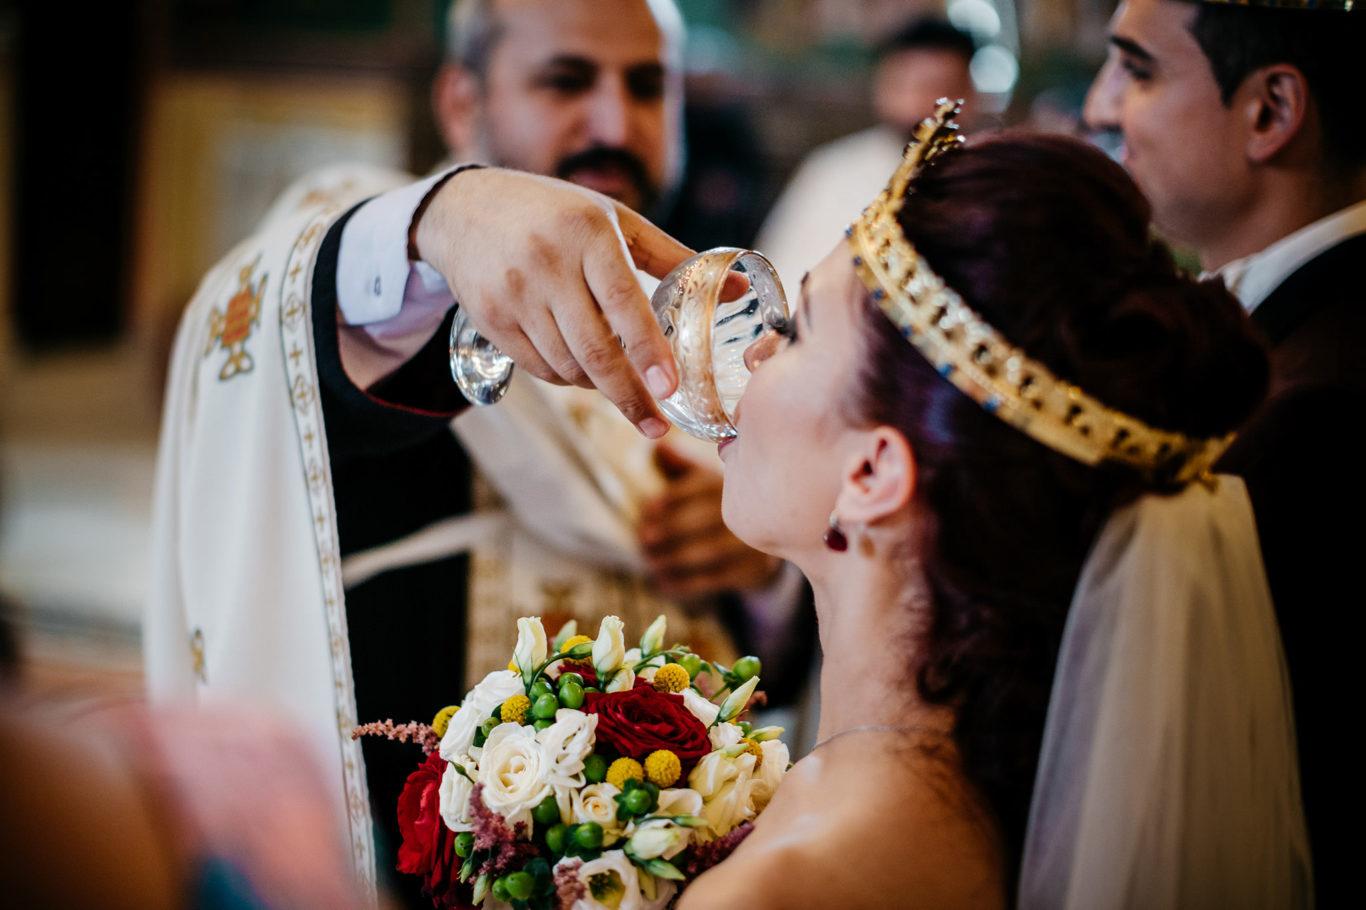 0410-fotografie-nunta-bucuresti-cristina-nicusor-fotograf-ciprian-dumitrescu-cd2_0608